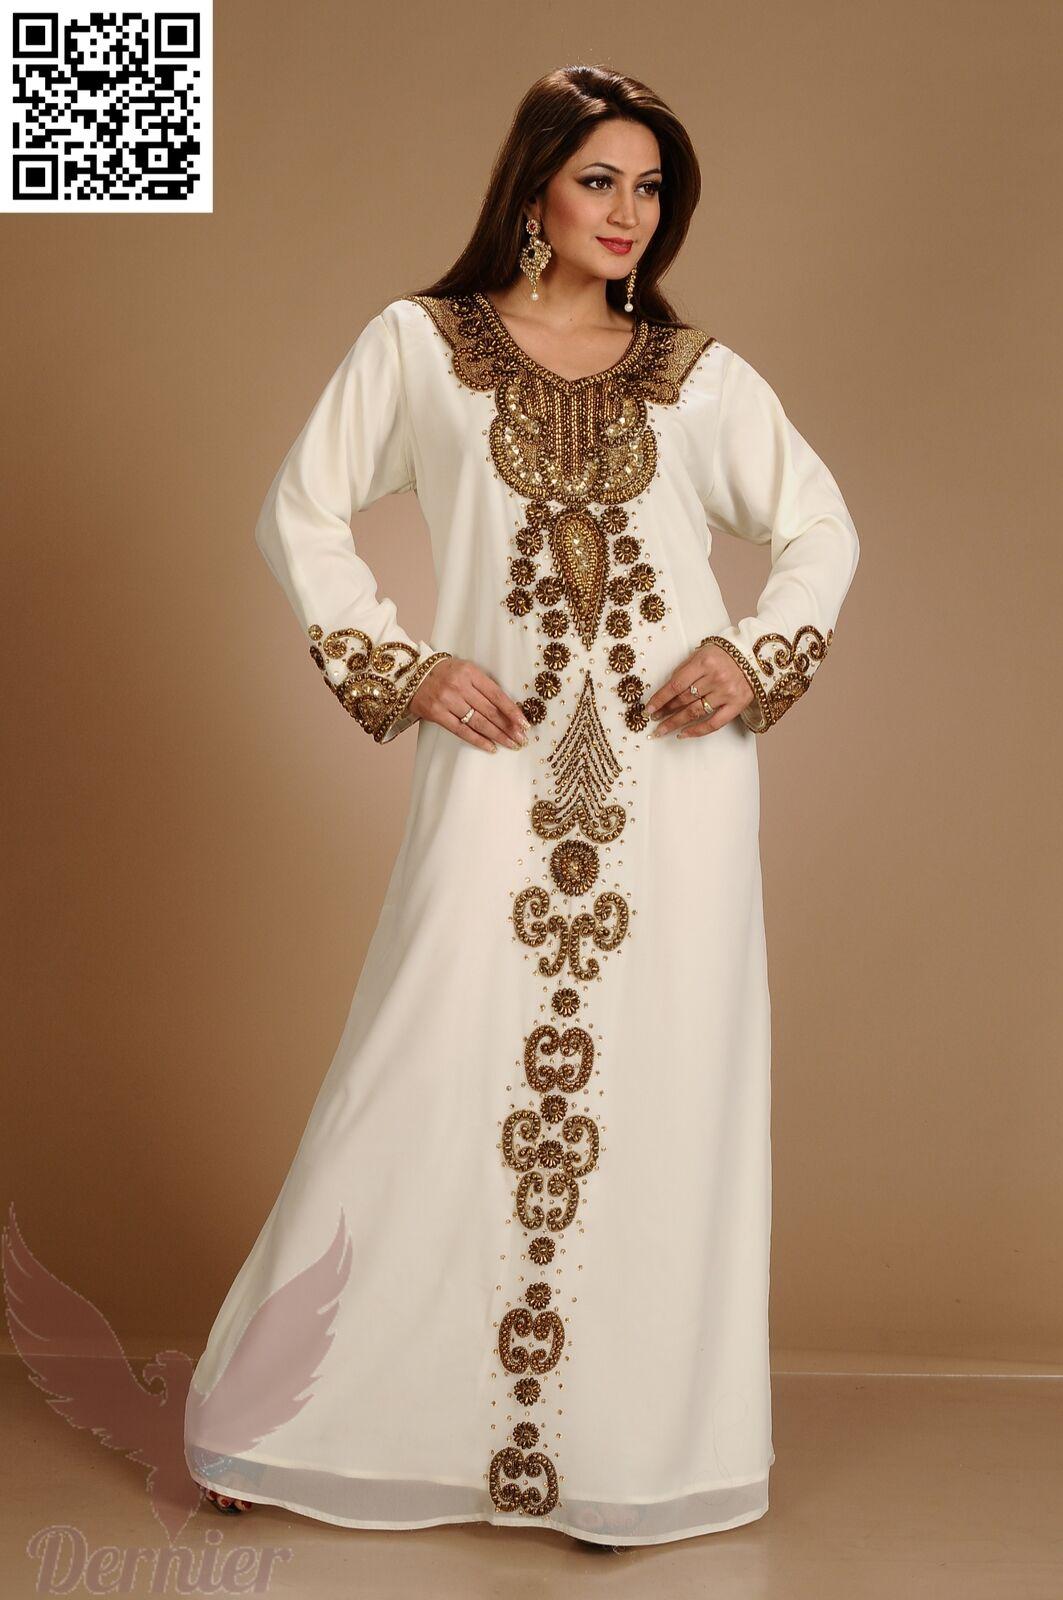 Bridal Women Kaftan Islamic Abaya Belt New MgoldCCAN MgoldCCAN MgoldCCAN Farasha Jilbab Dress  K31 3cbfab